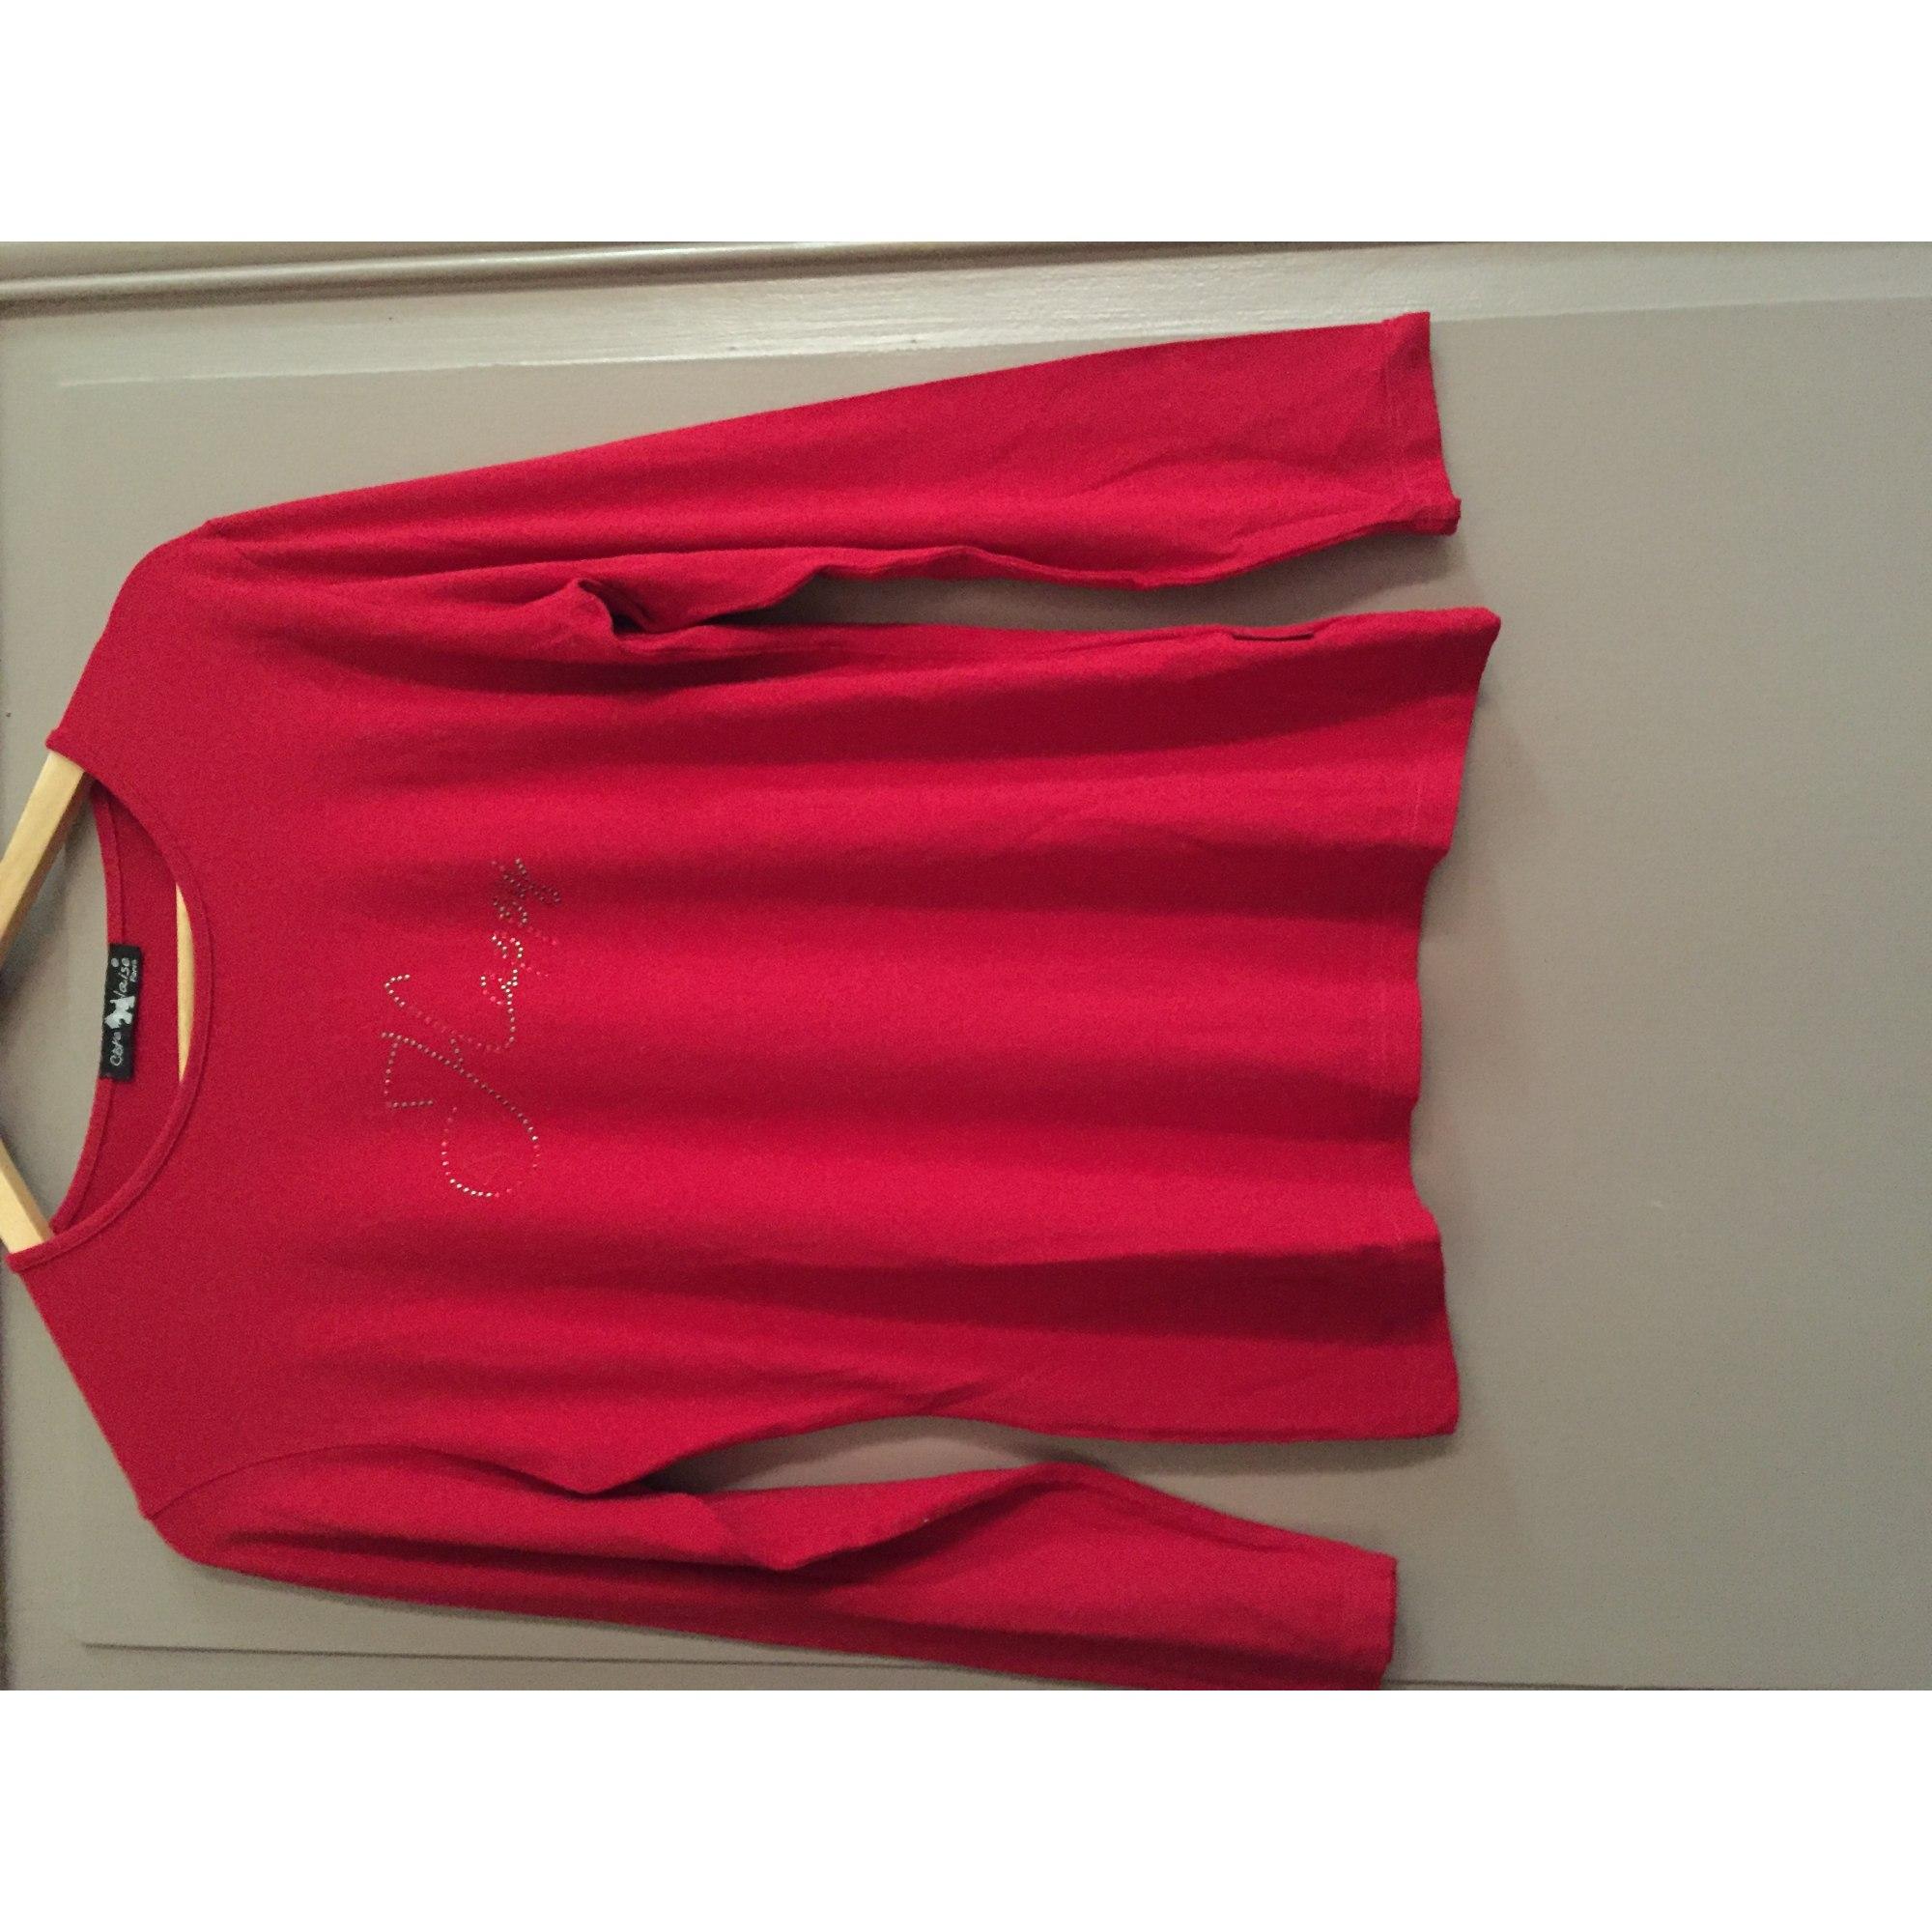 Top, tee-shirt CÔTE ANGLAISE Rouge, bordeaux